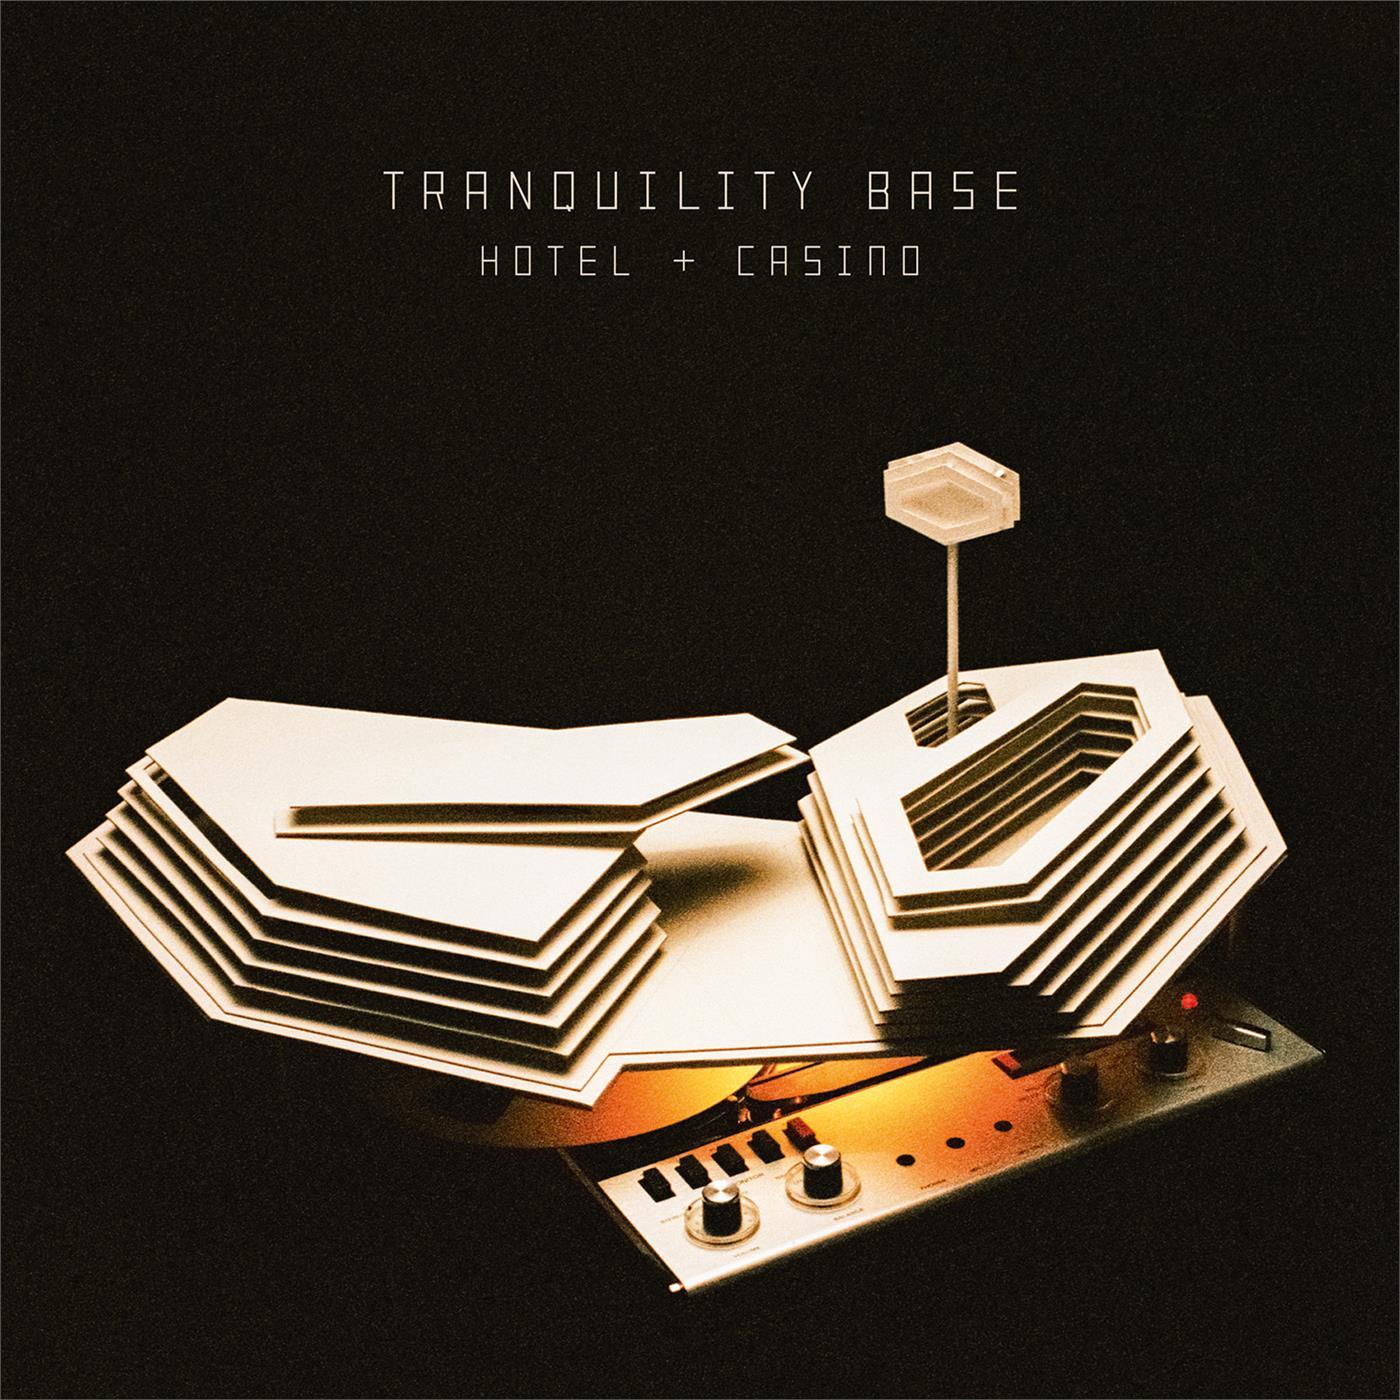 Arctic Monkeys – Tranquility Base Hotel + Casino [LTD 2xLP]